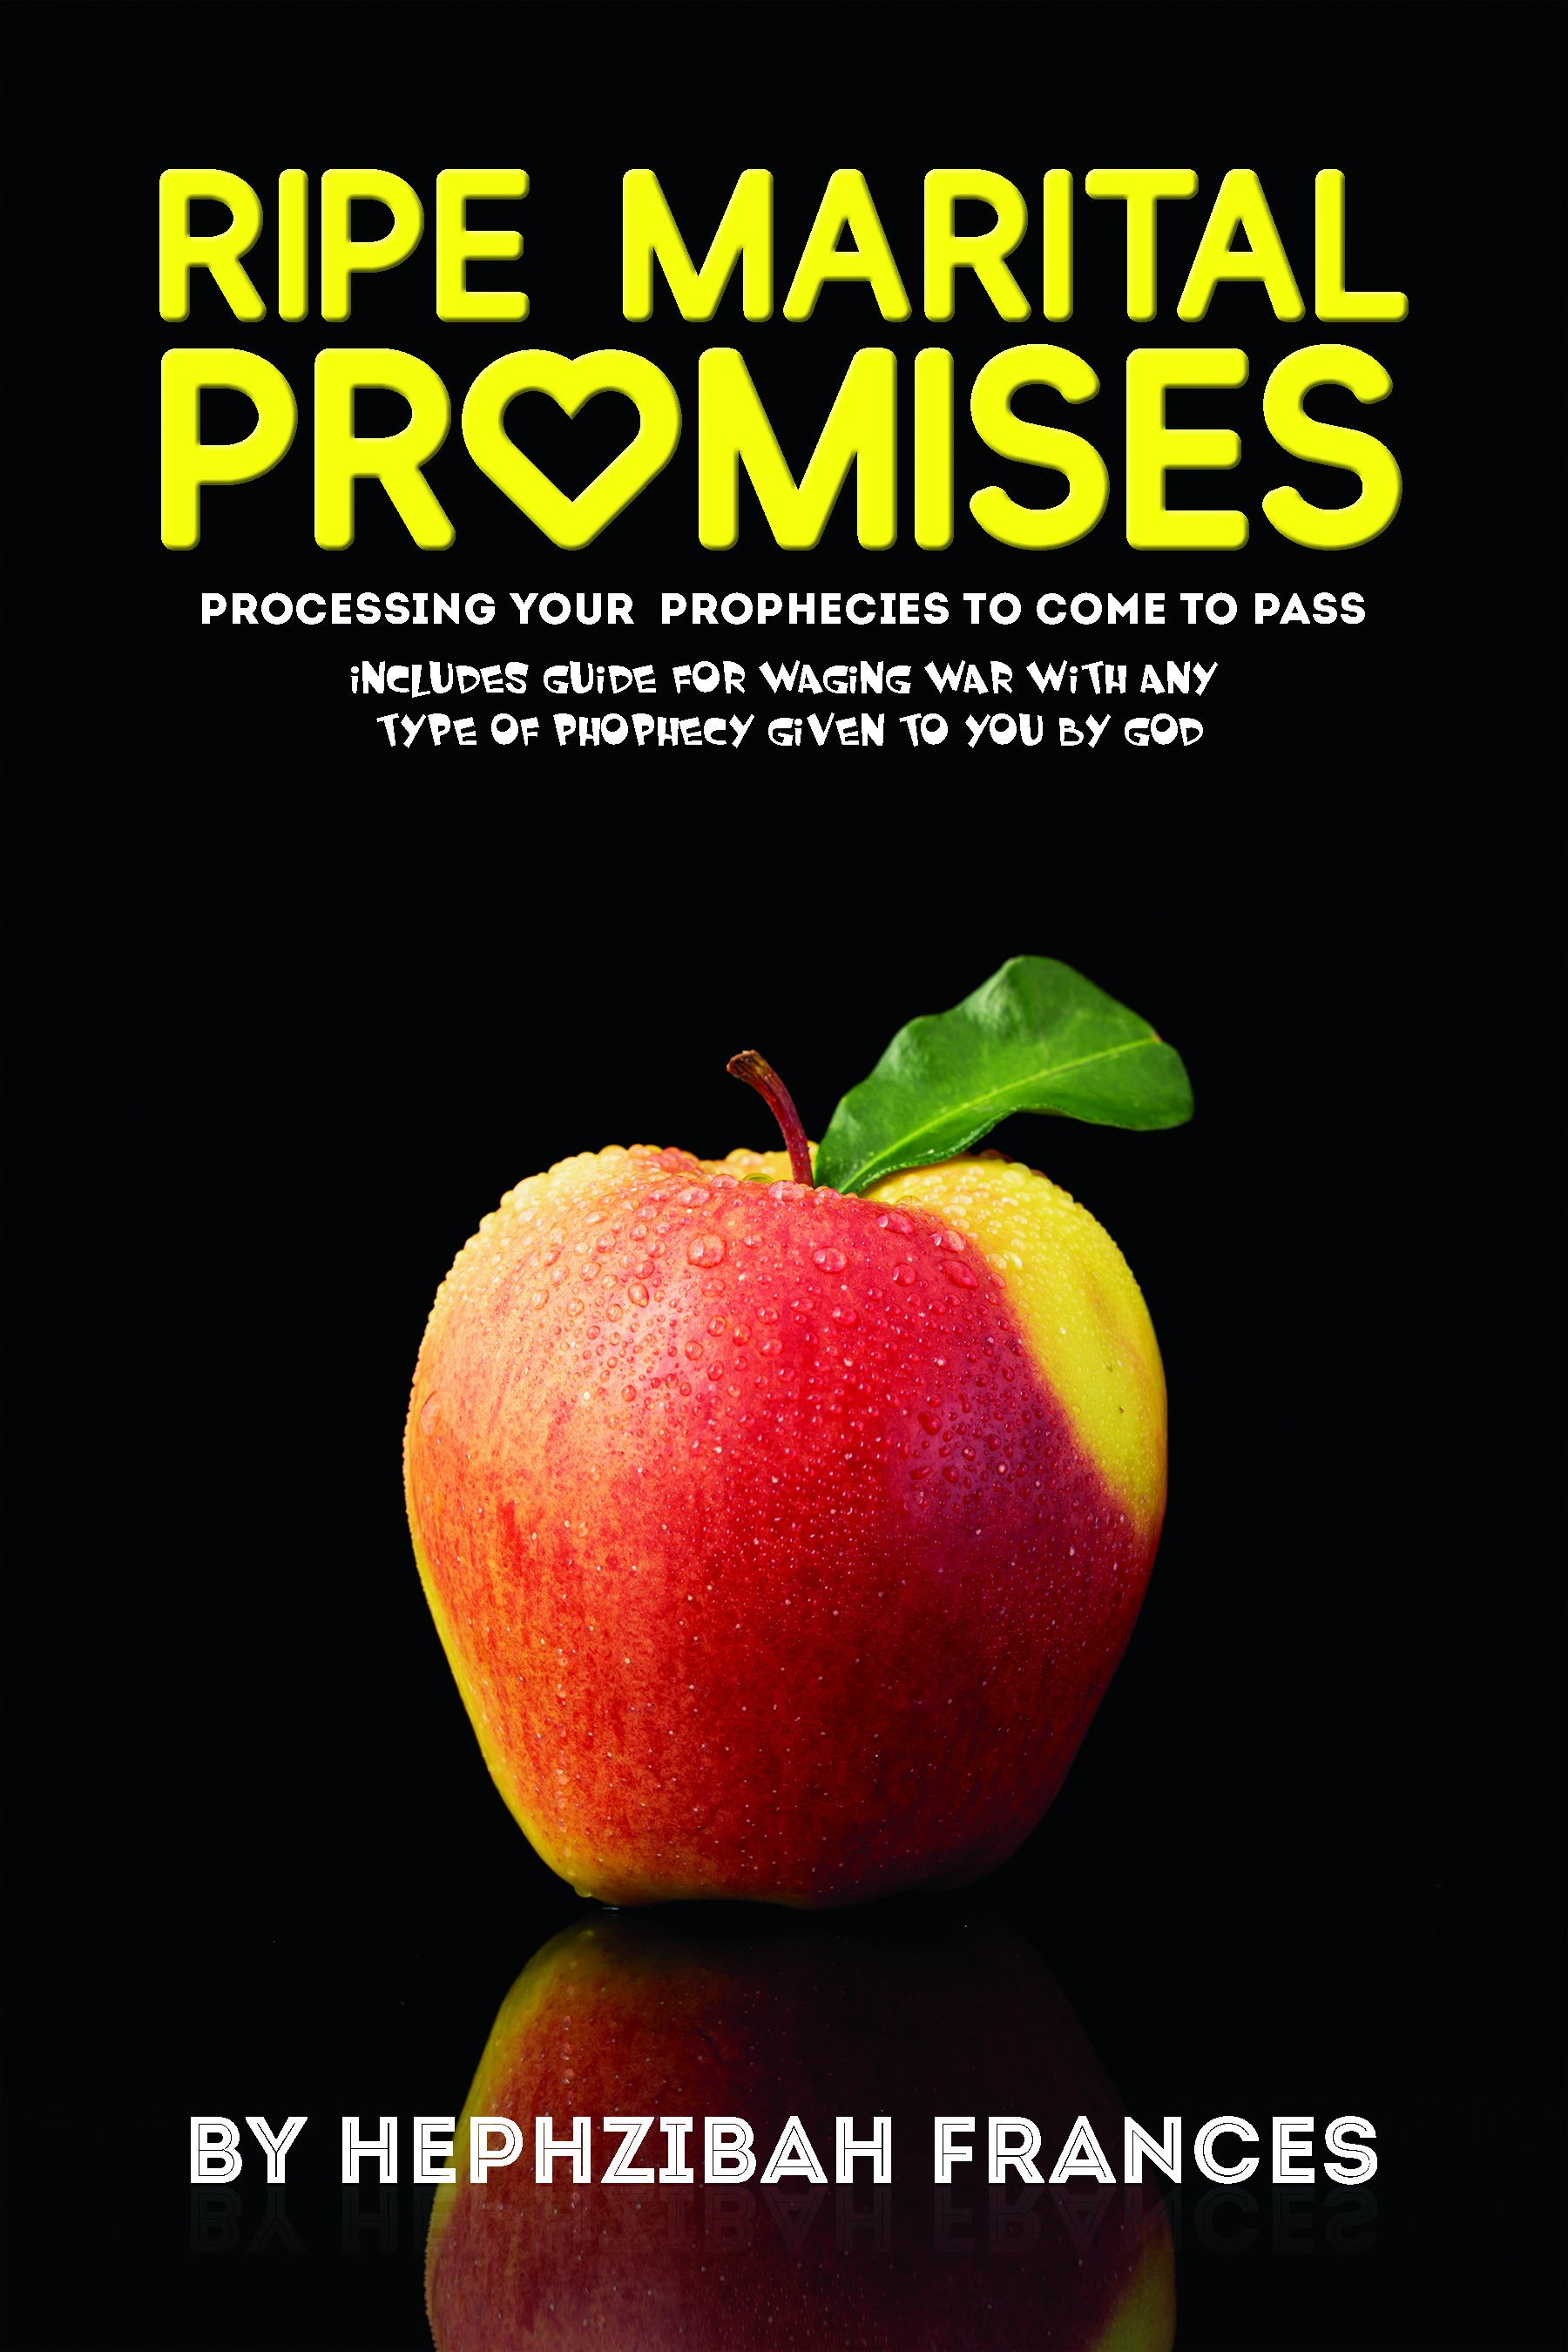 Ripe Marital Promises